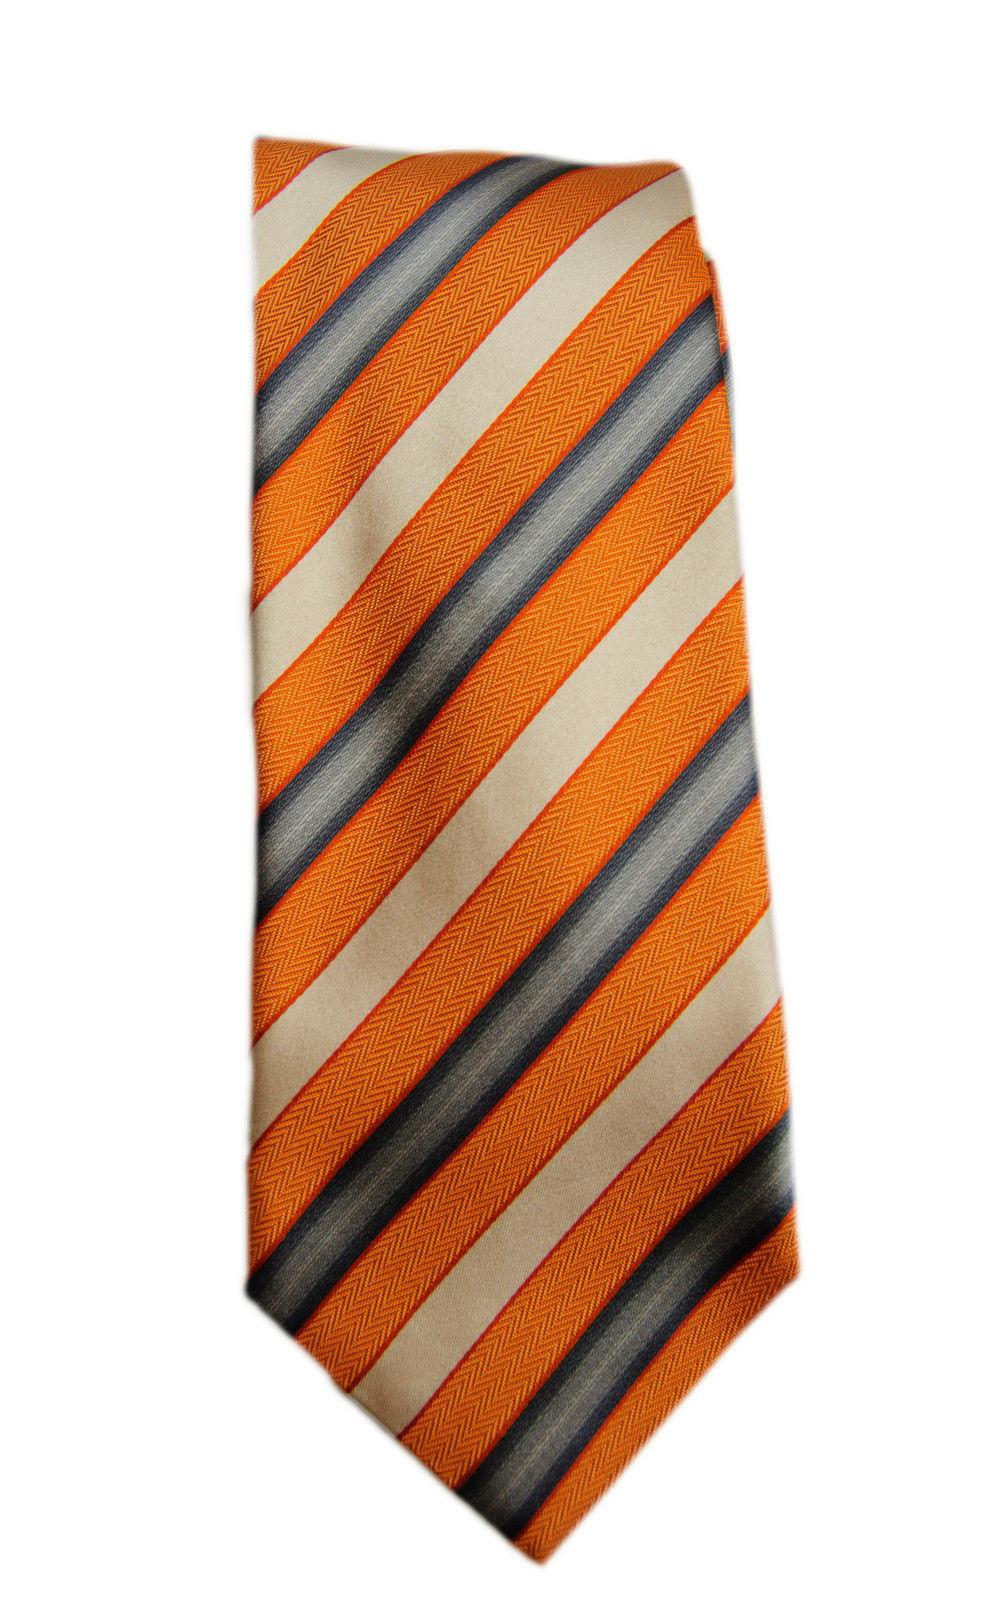 Vintage Orange Striped Ermenegildo Zegna 100% Silk Tie - $62.03